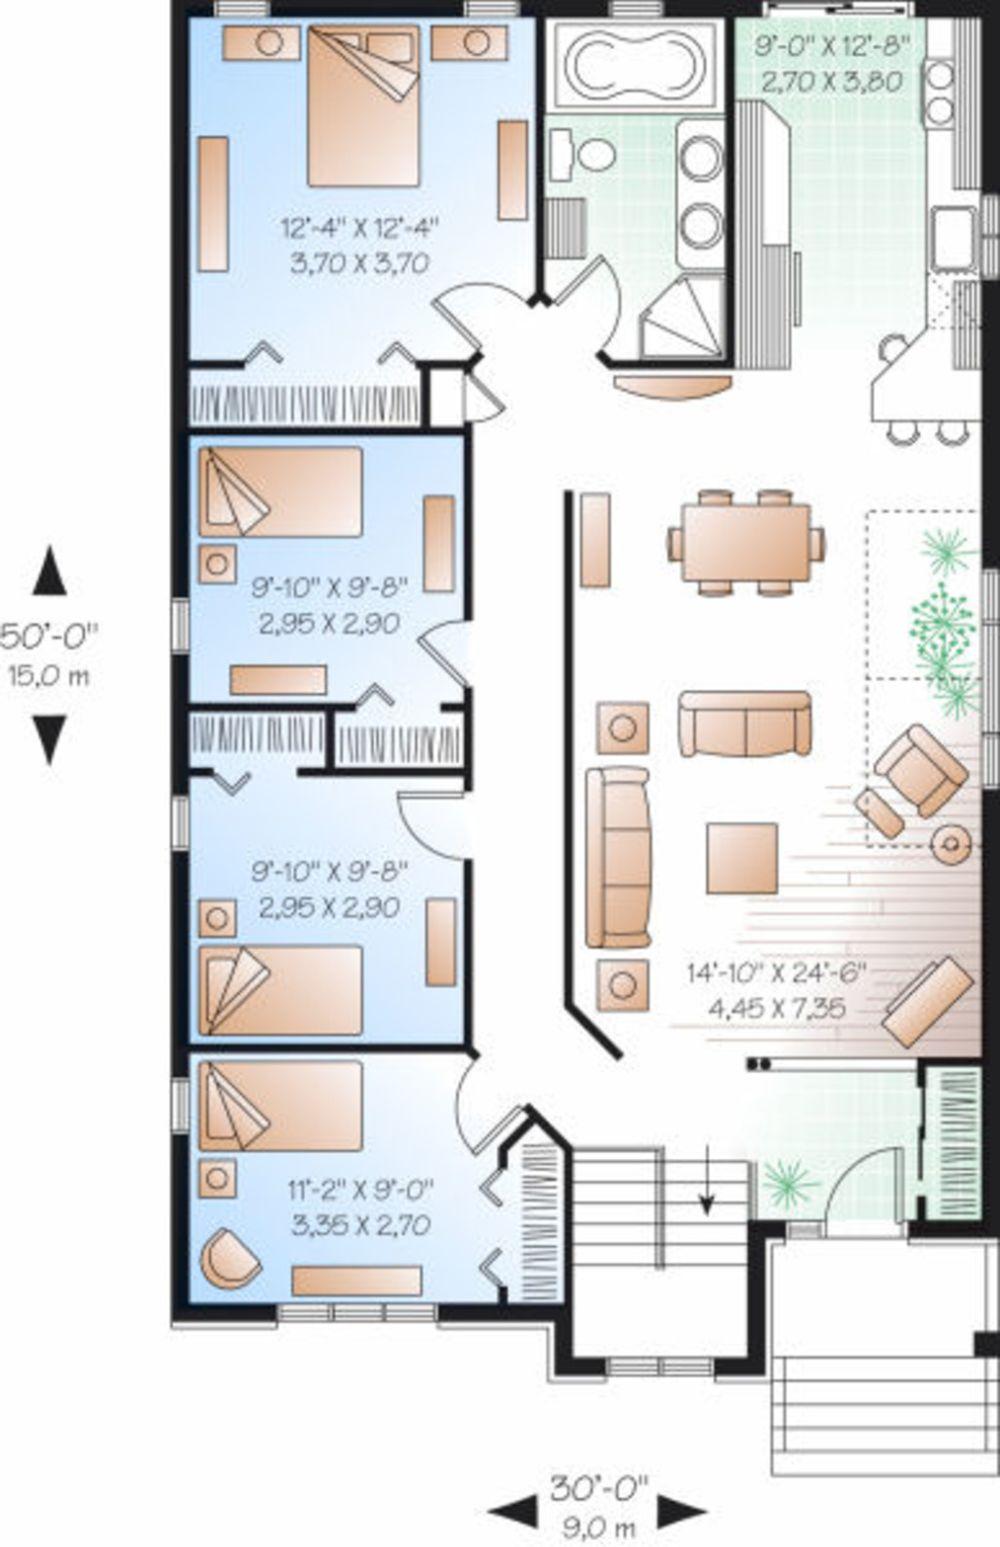 Plano de casa europea de 4 dormitorios en 1 planta for Planos de casas 1 planta